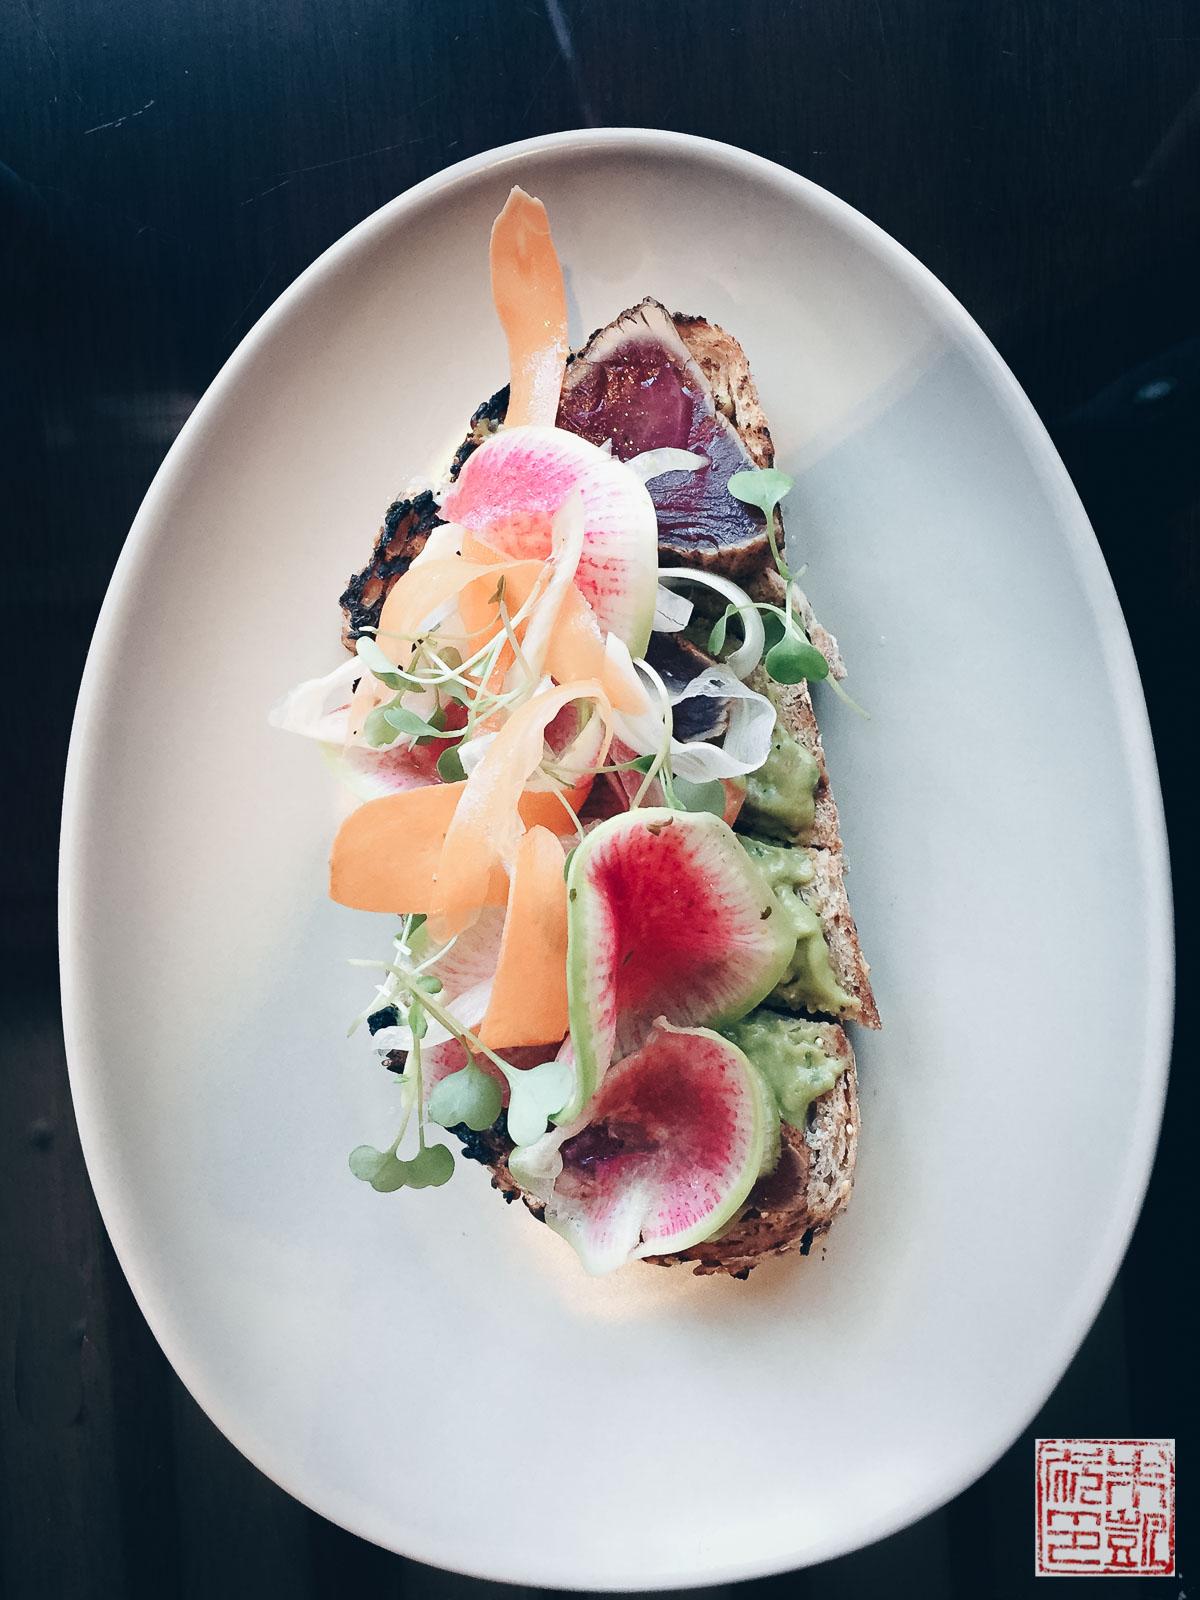 ritz-carlton-lake-tahoe-avocado-toast